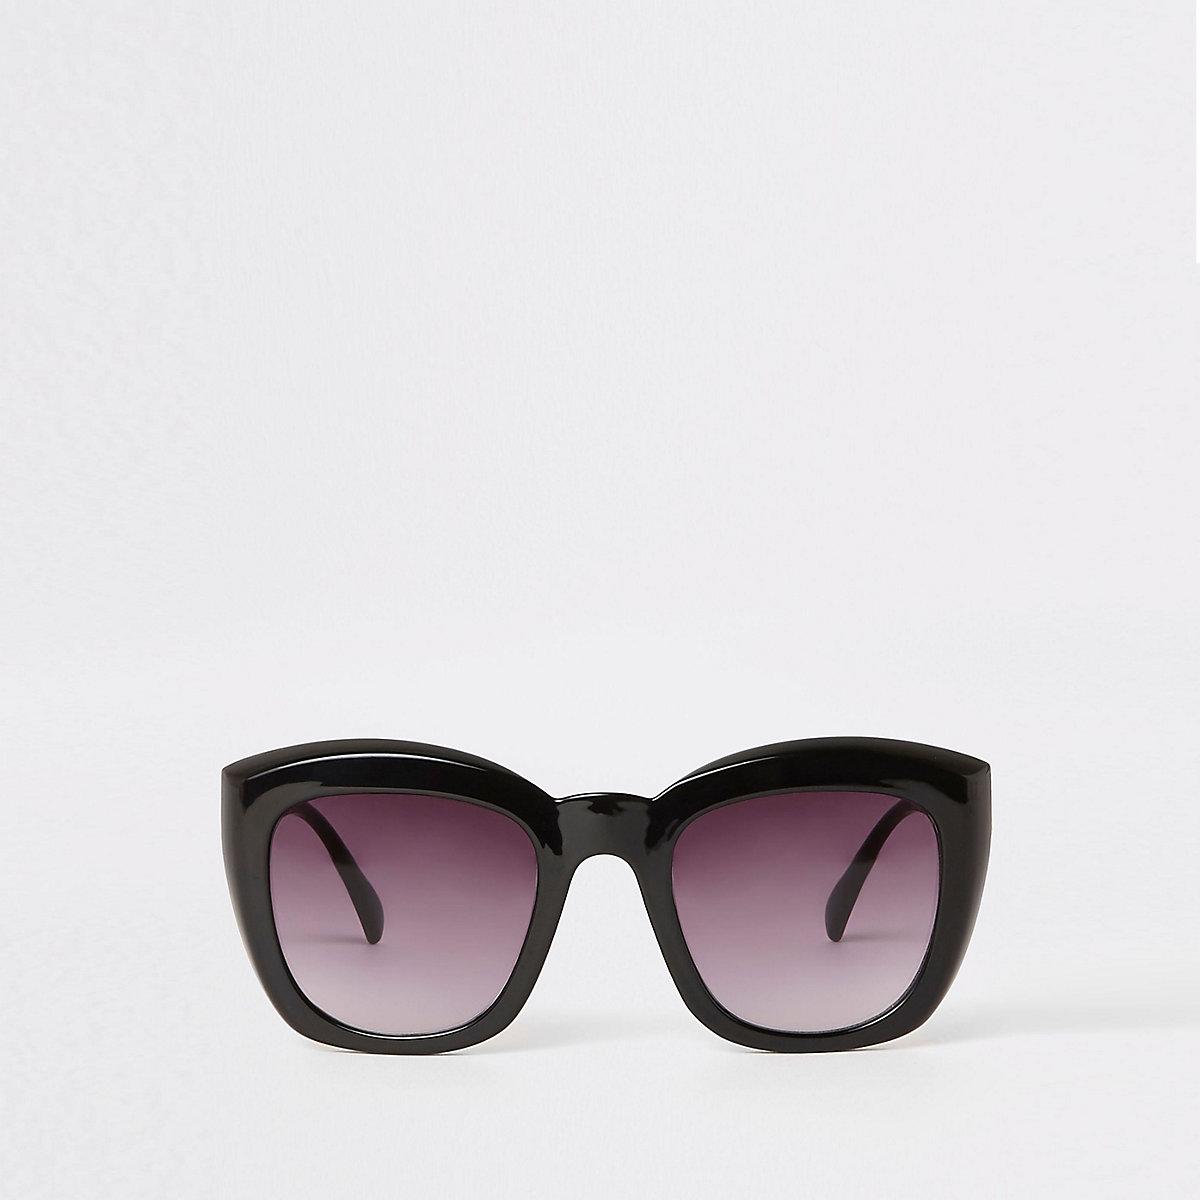 Black smoke lens square glam sunglasses - Oversized Sunglasses - Sunglasses  - women c7a2aaf00c